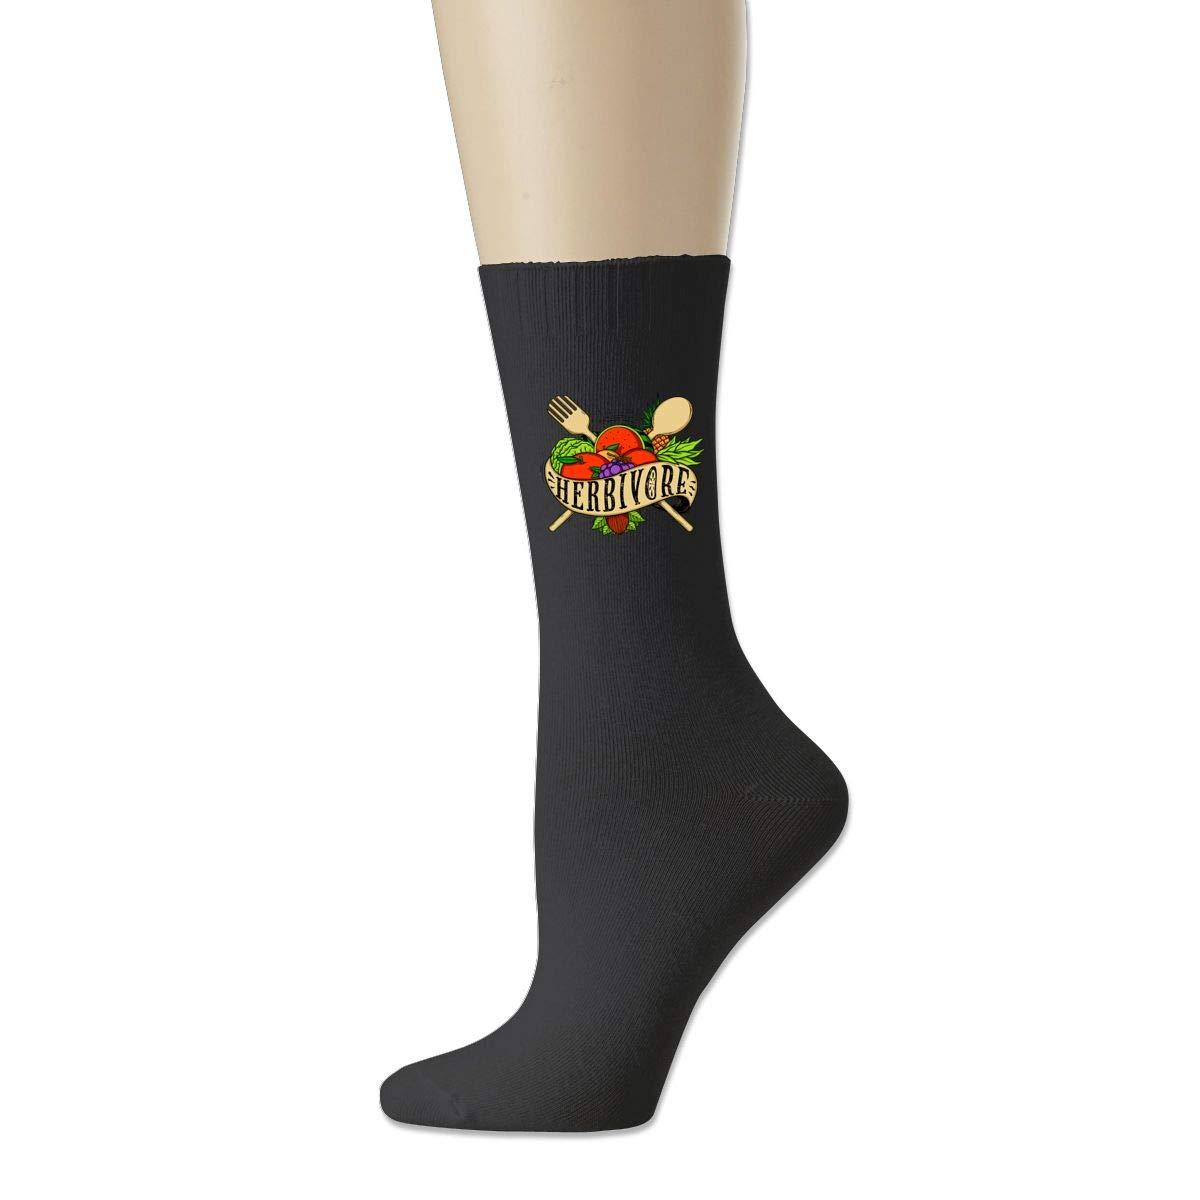 Rigg-socks Vegetarian Multiple Fruits Mens Comfortable Sport Socks Black